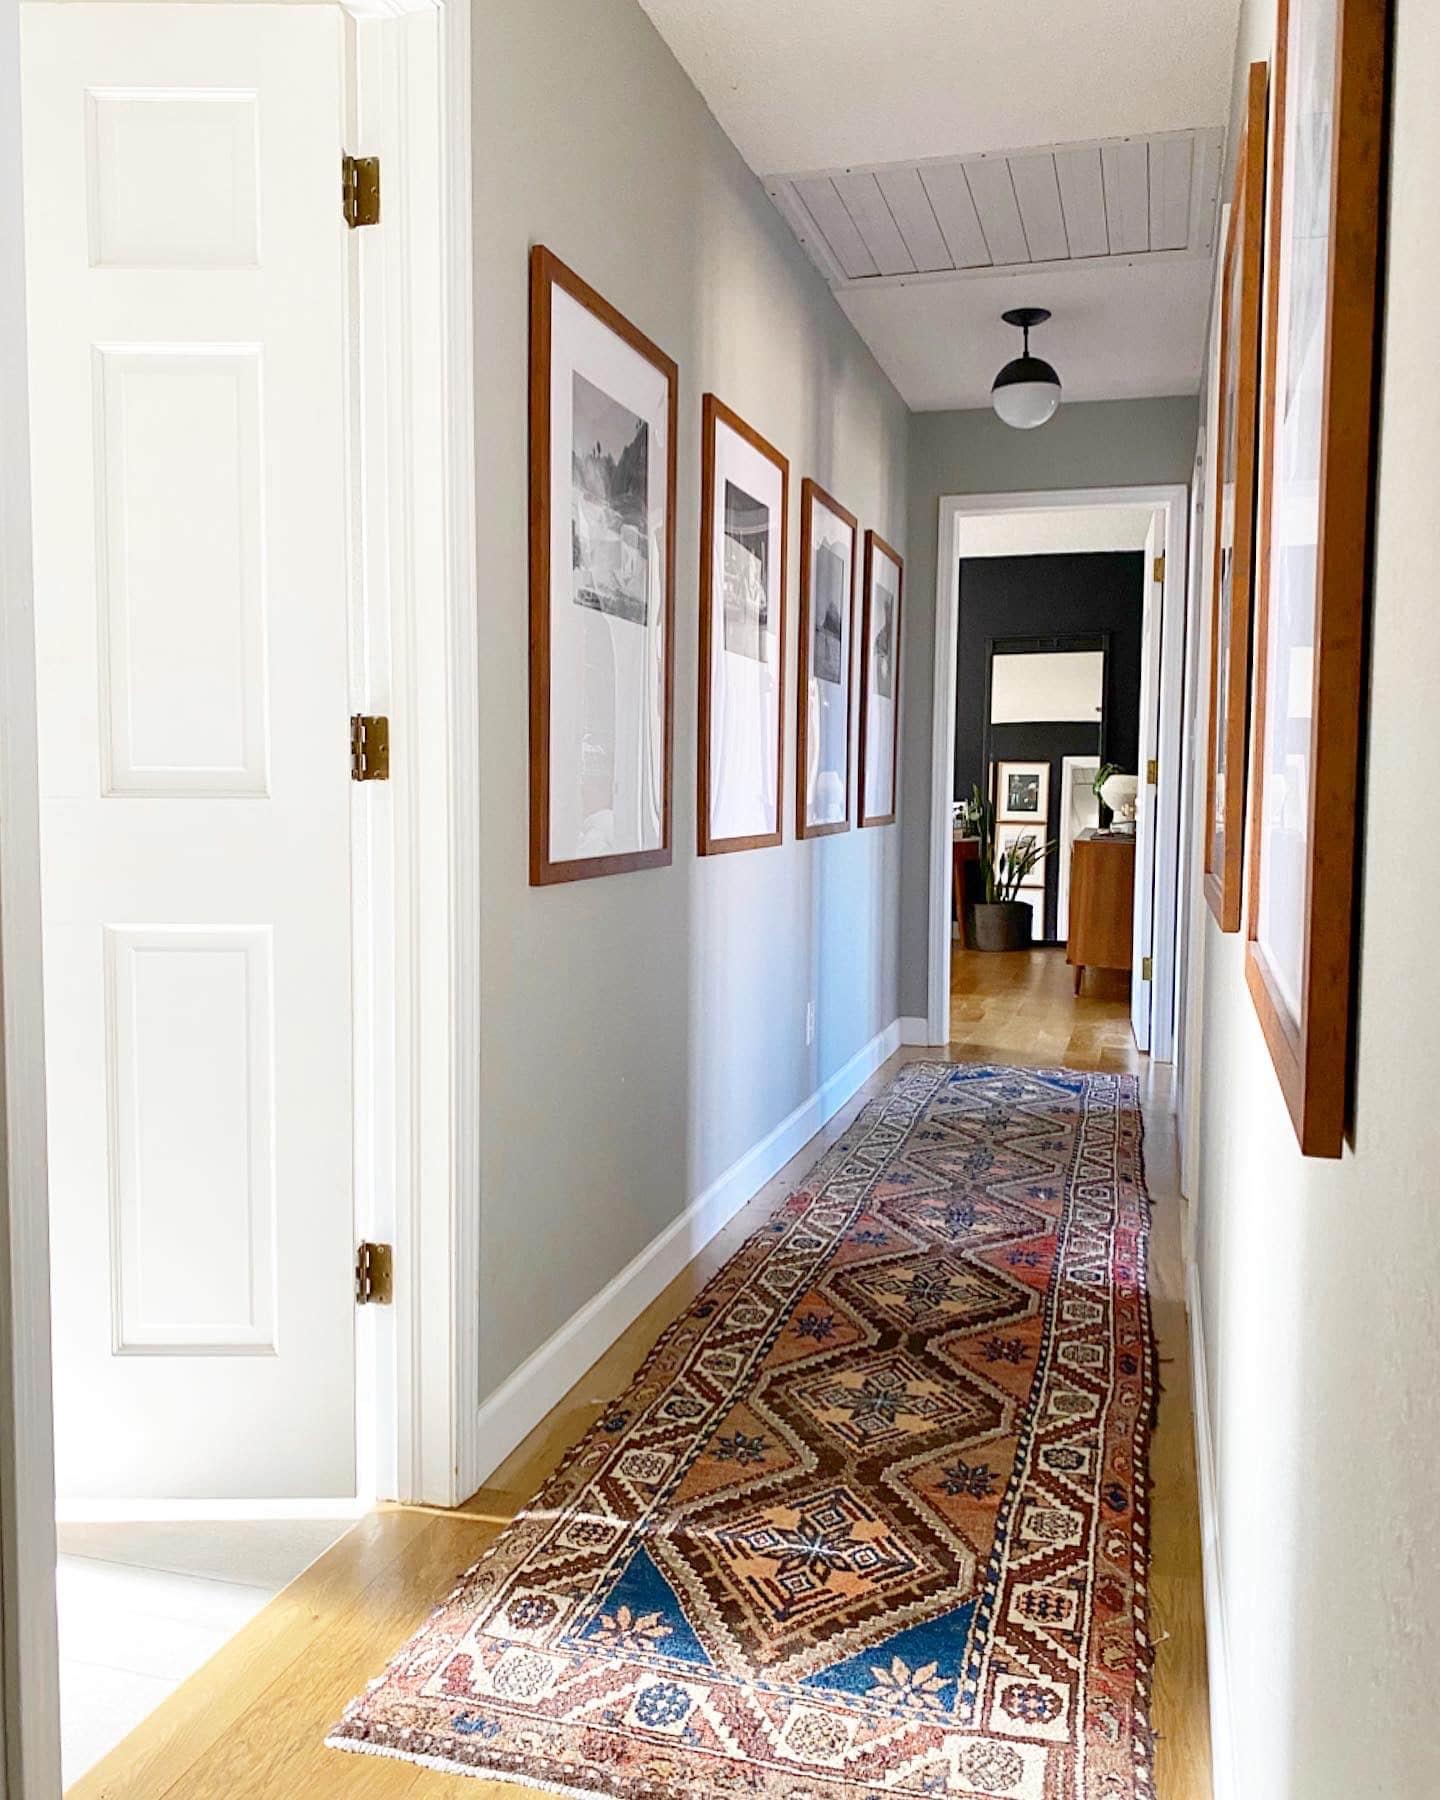 Gallery wall in hallway